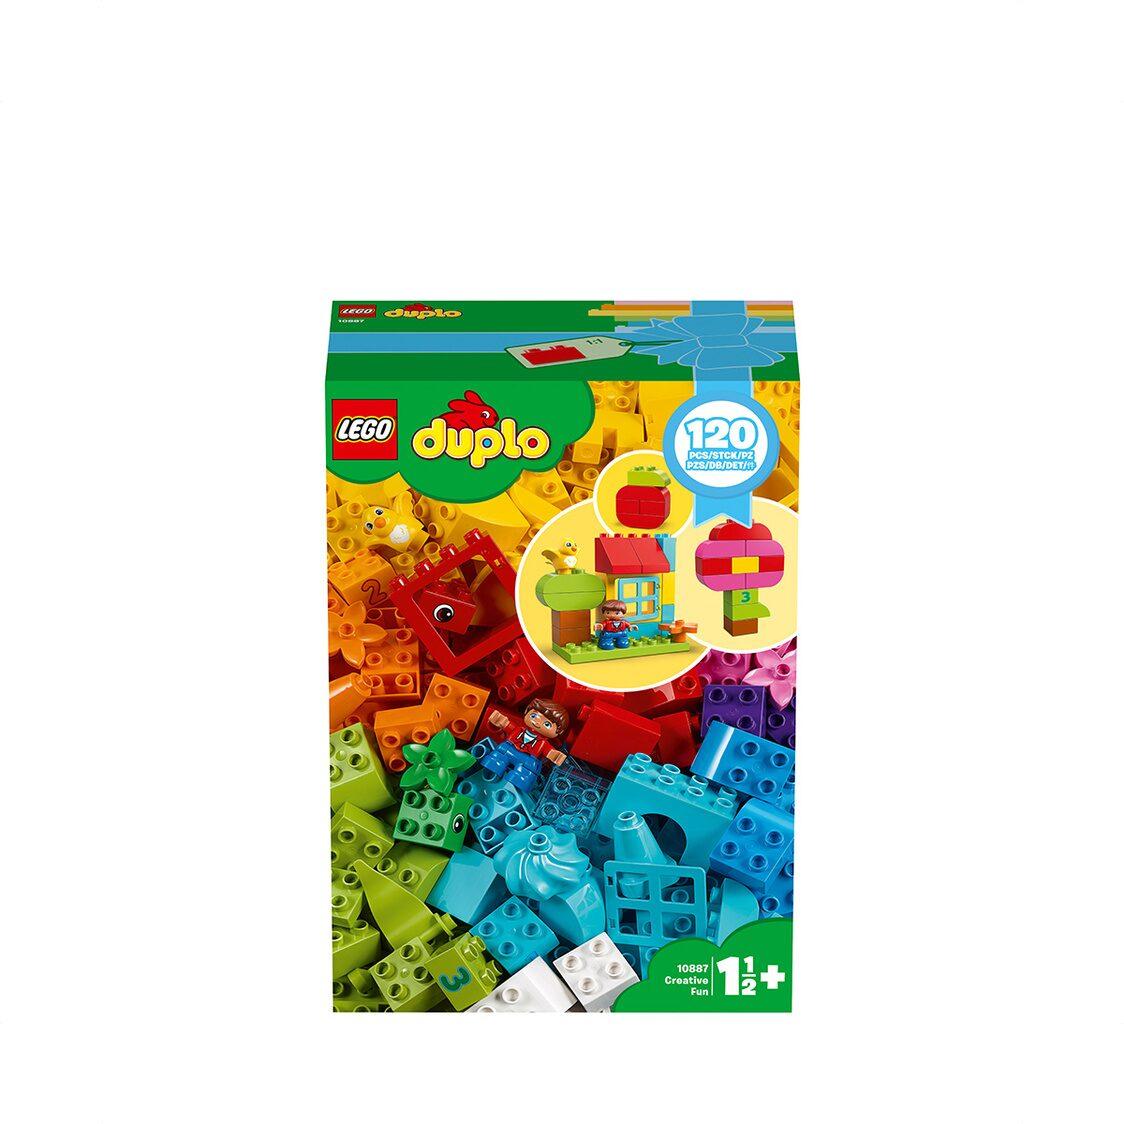 LEGO DUPLO - Creative Fun 10887